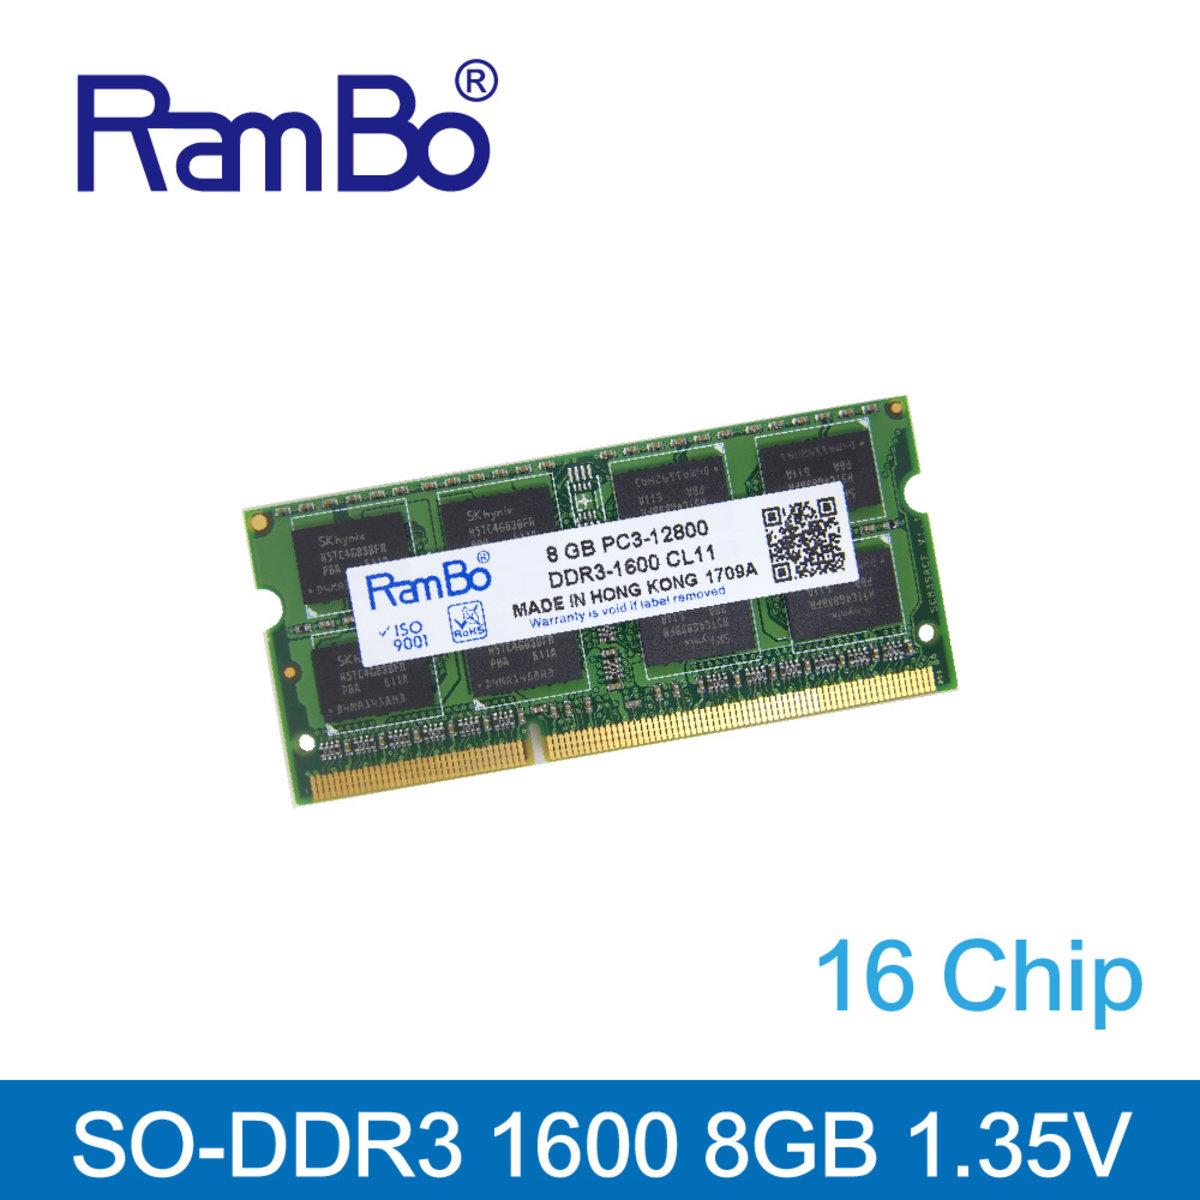 8GB DDR3 1600MHz SO DIMM 16-Chip(雙面) 1.35V 記憶體 內存條 筆記本電腦適用 Notebook